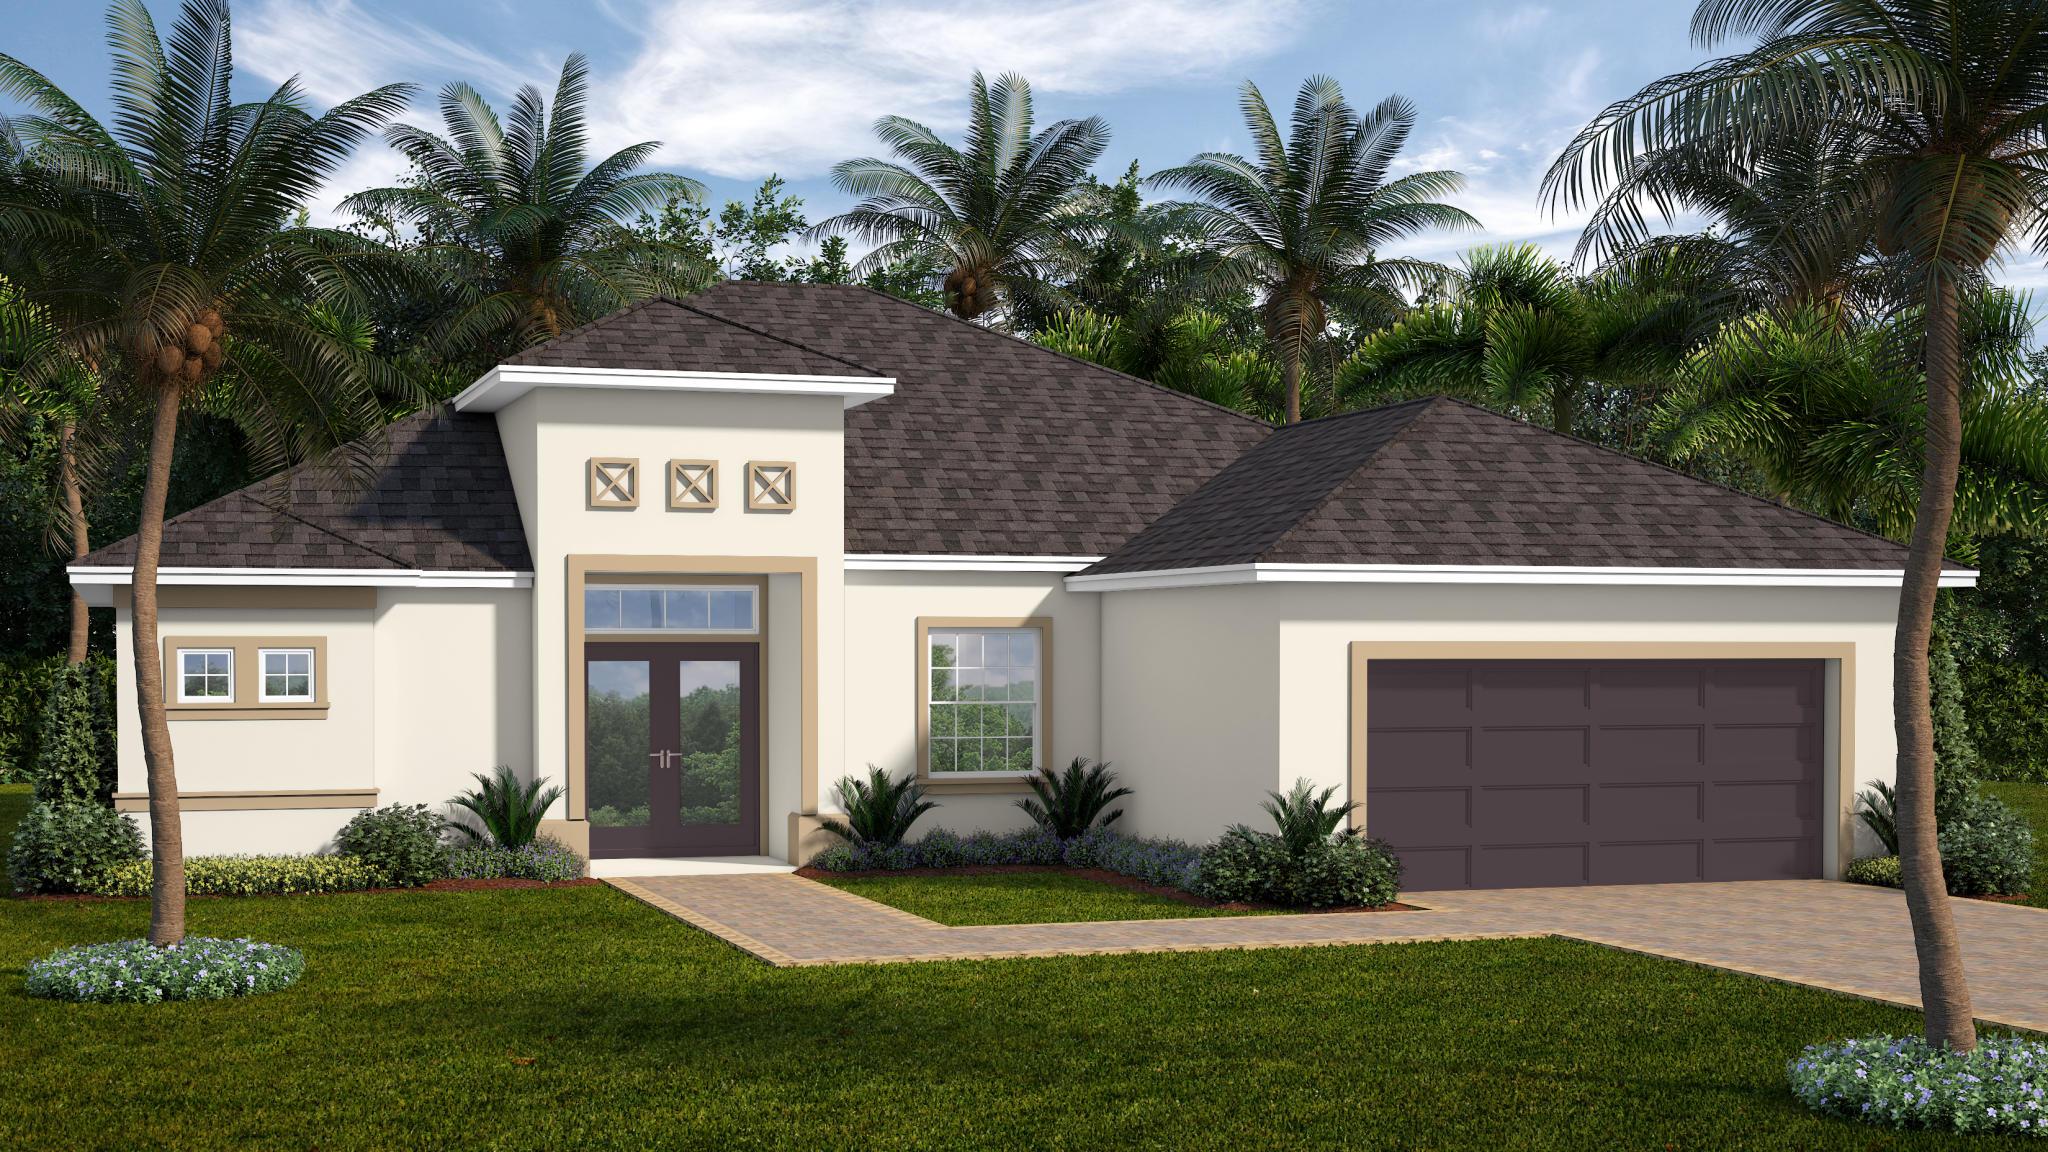 Incredible Hampton Bay Plan Palm Coast Fl 32137 3 Bed 2 Bath Single Family Home Trulia Download Free Architecture Designs Scobabritishbridgeorg